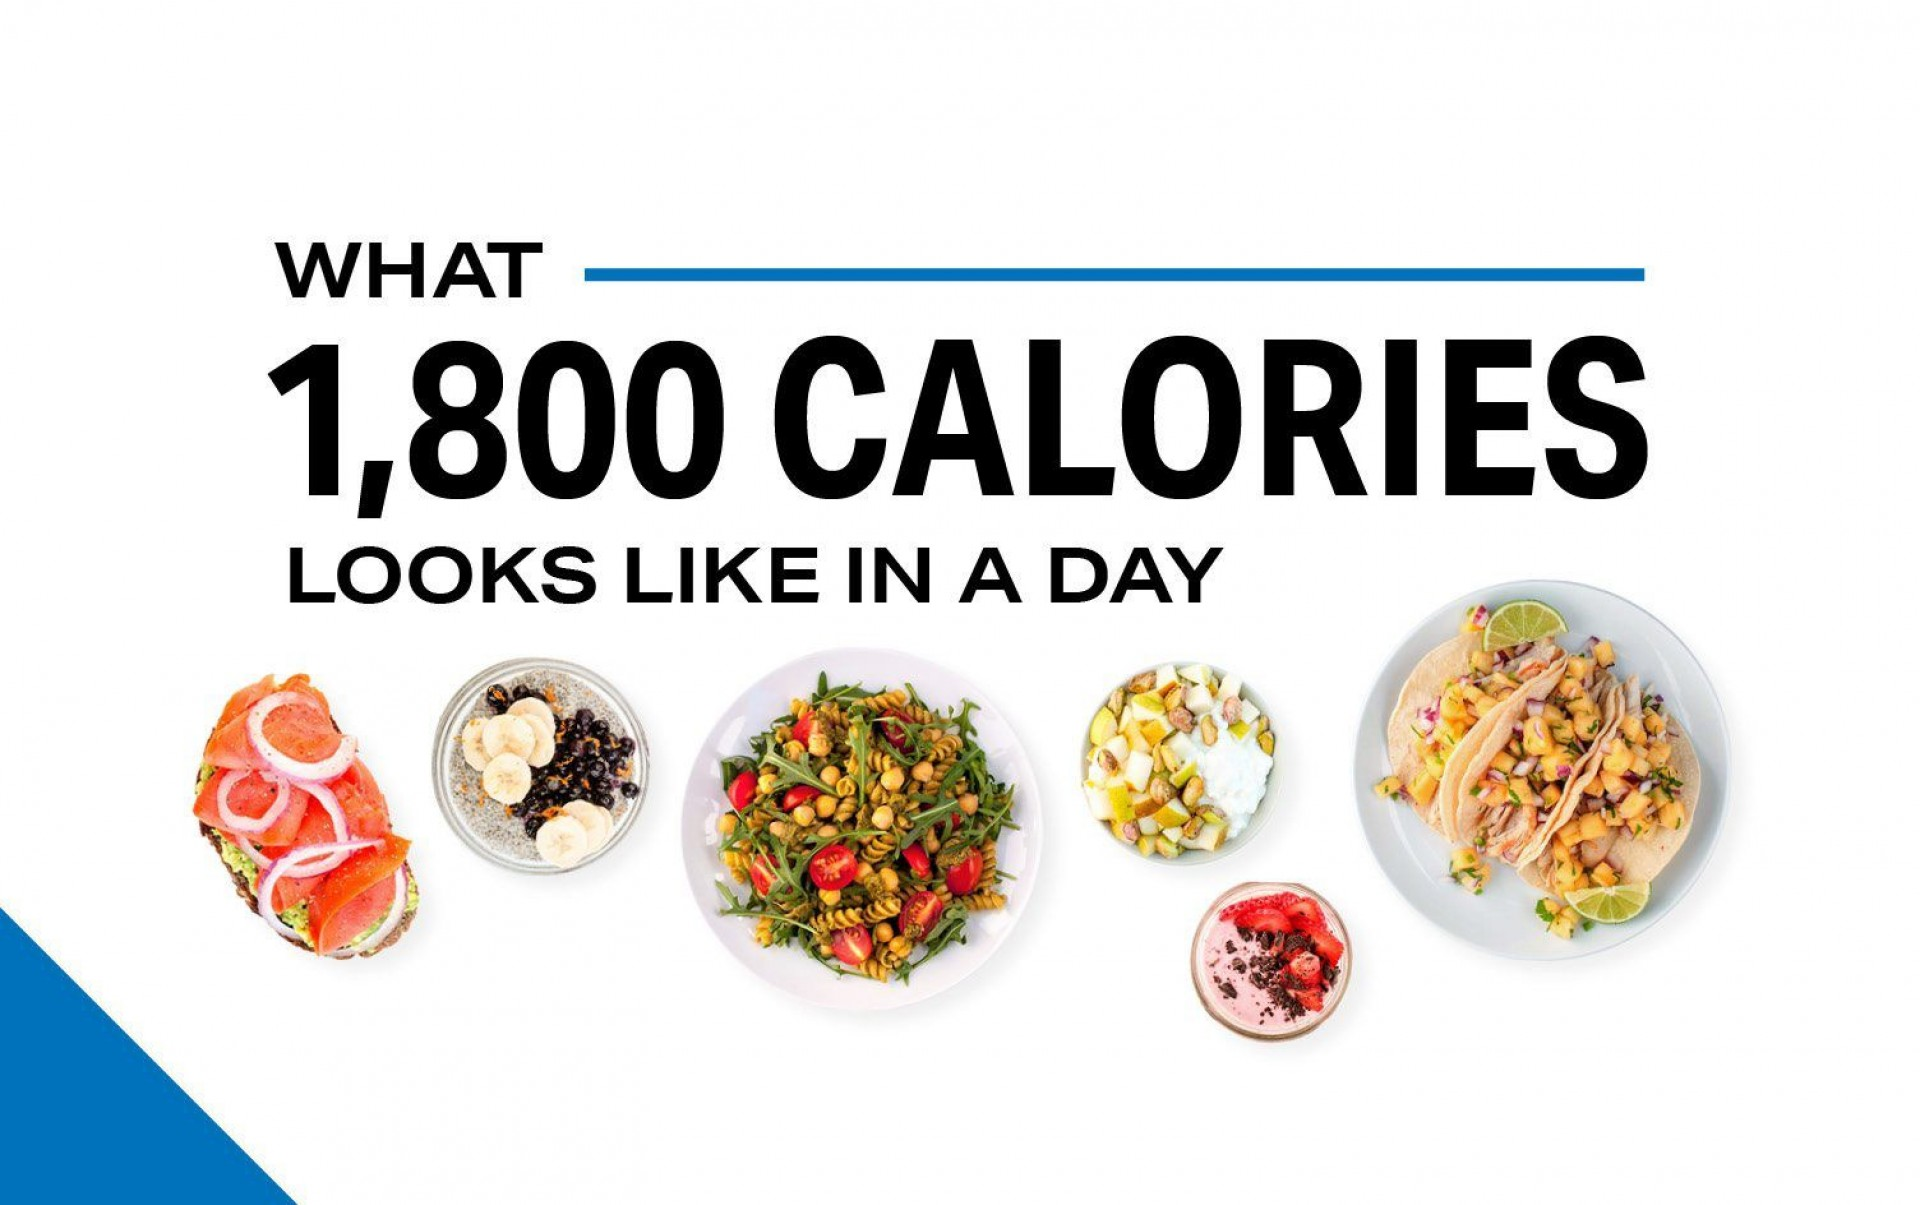 009 Fantastic Sample 1800 Calorie Meal Plan Pdf 1920